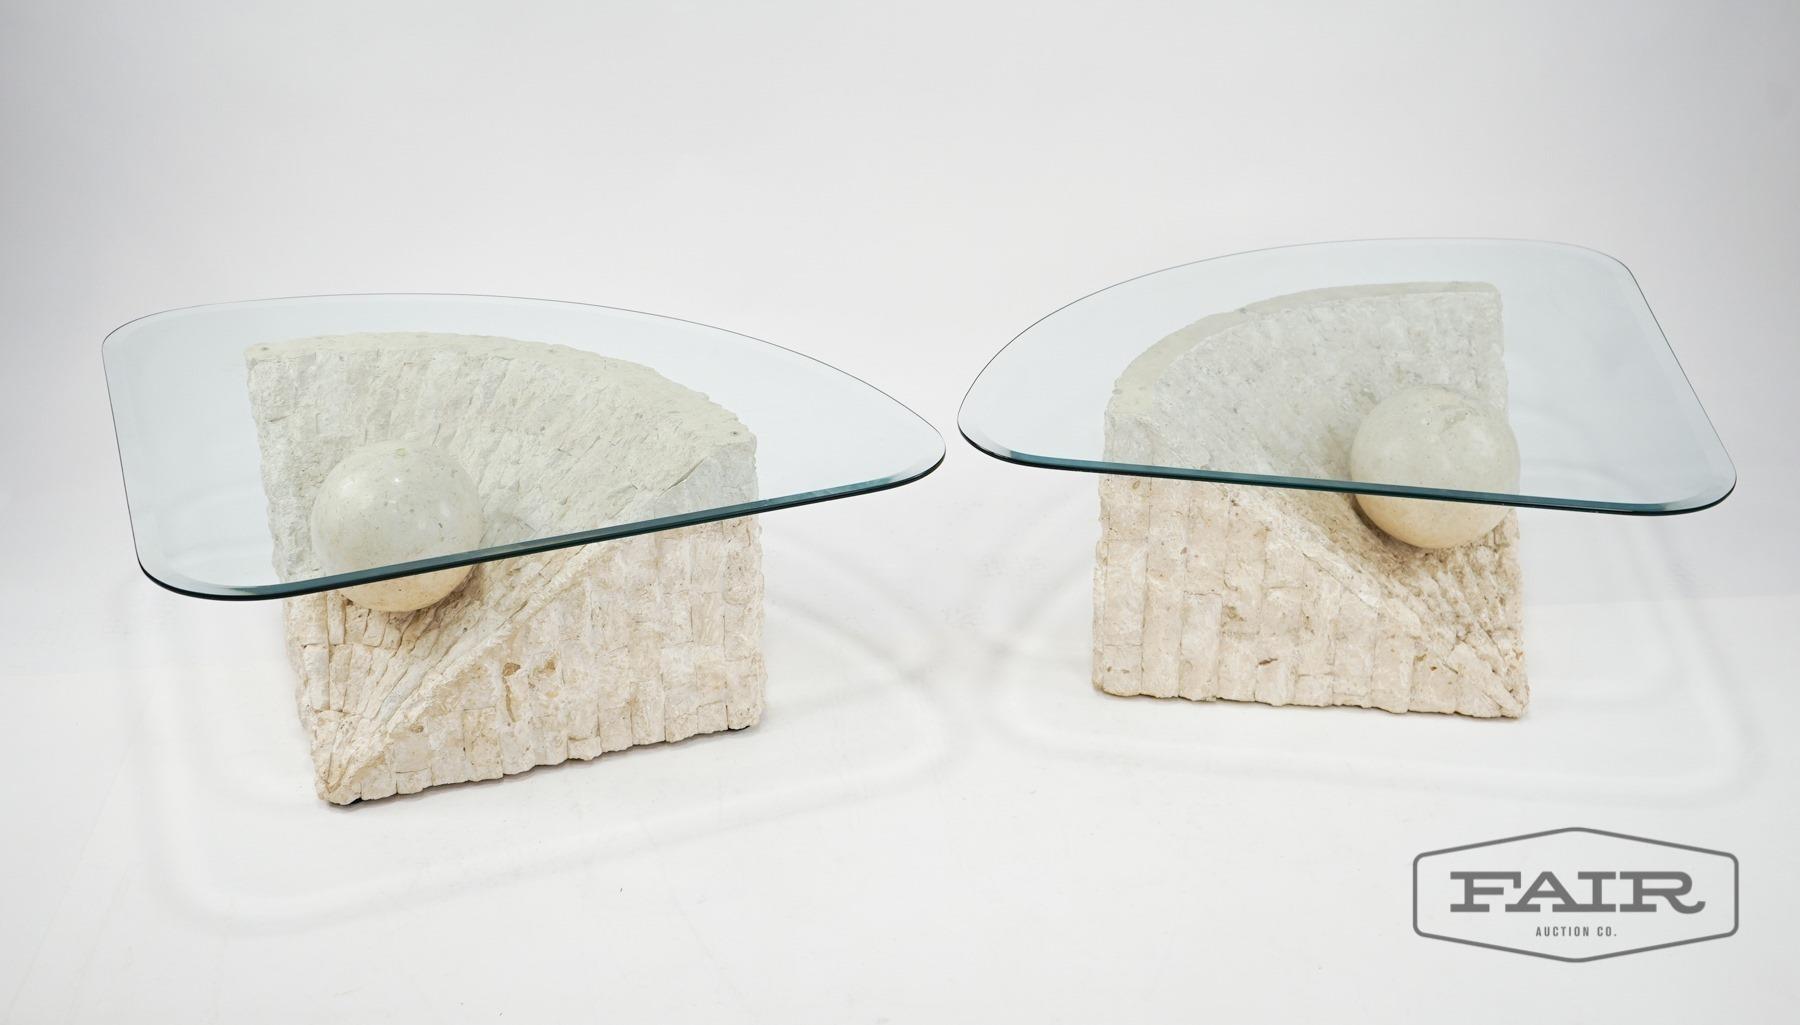 Pair Of Mactan Stone Glass Coffee Tables Fair Auction Company Llc